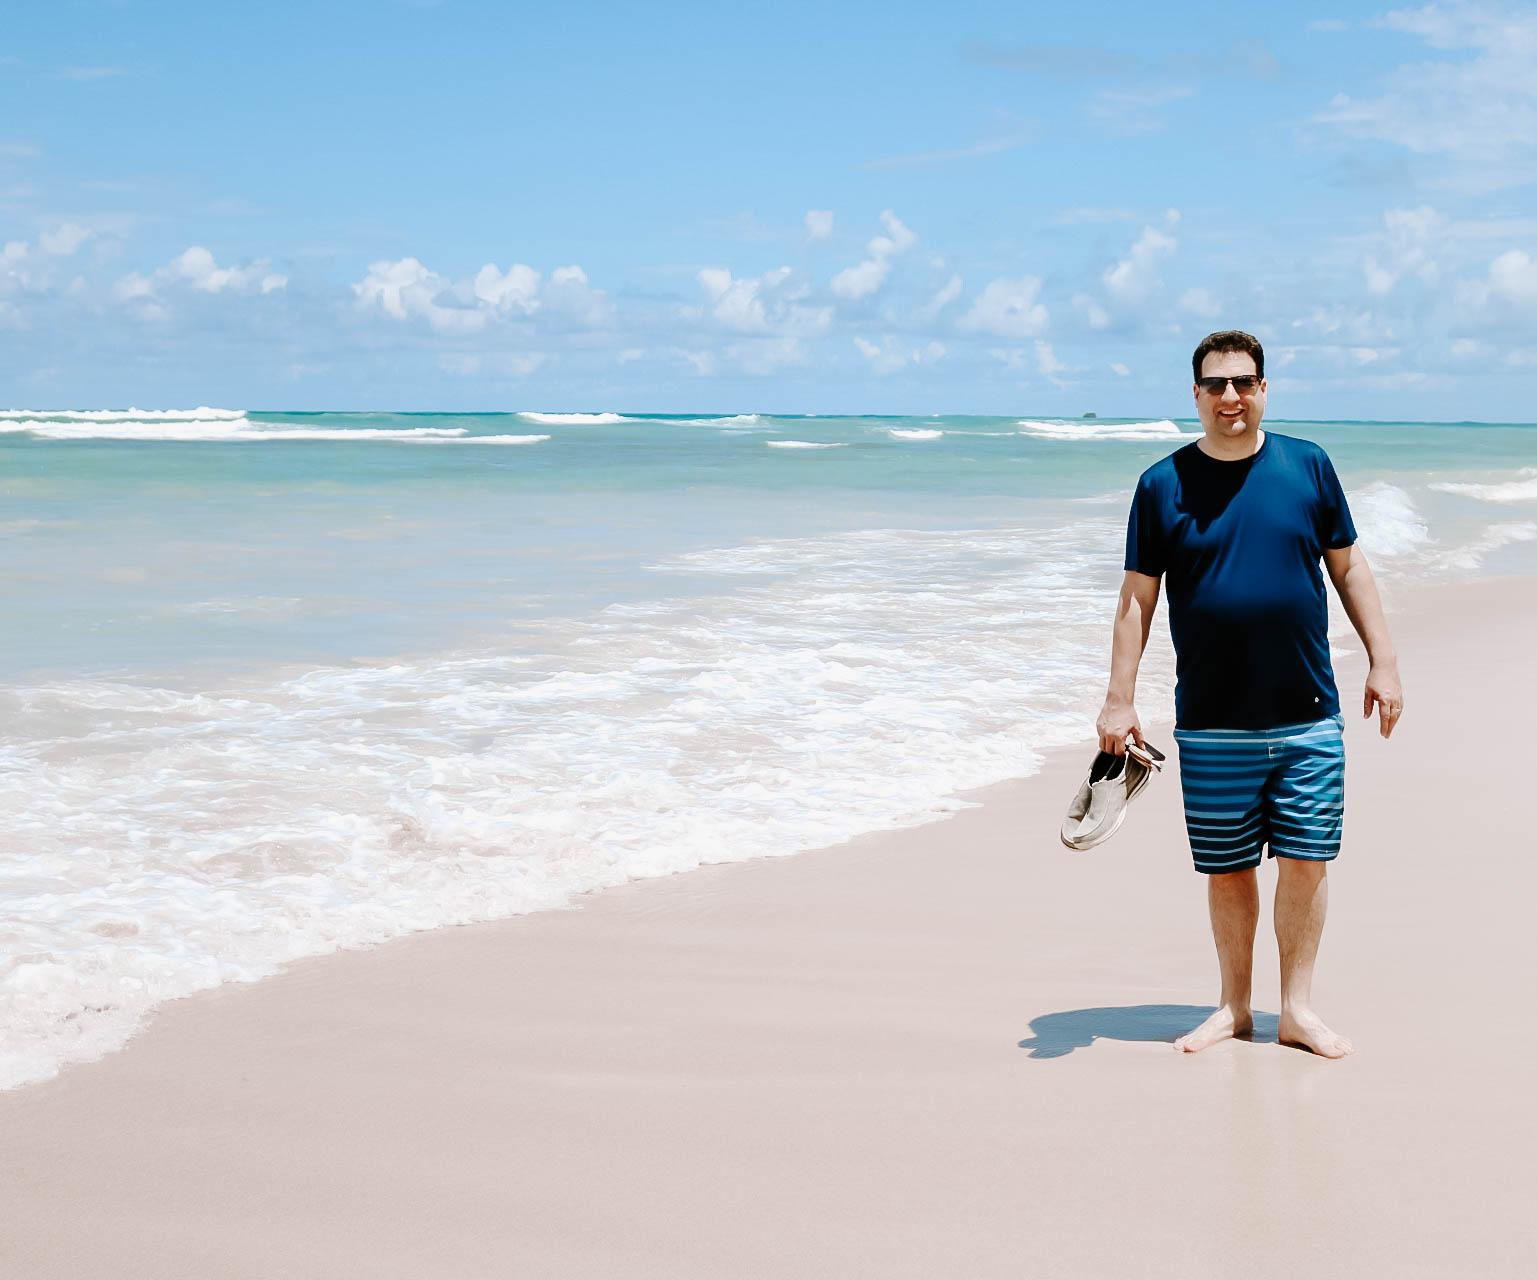 Jeff in Punta Cana